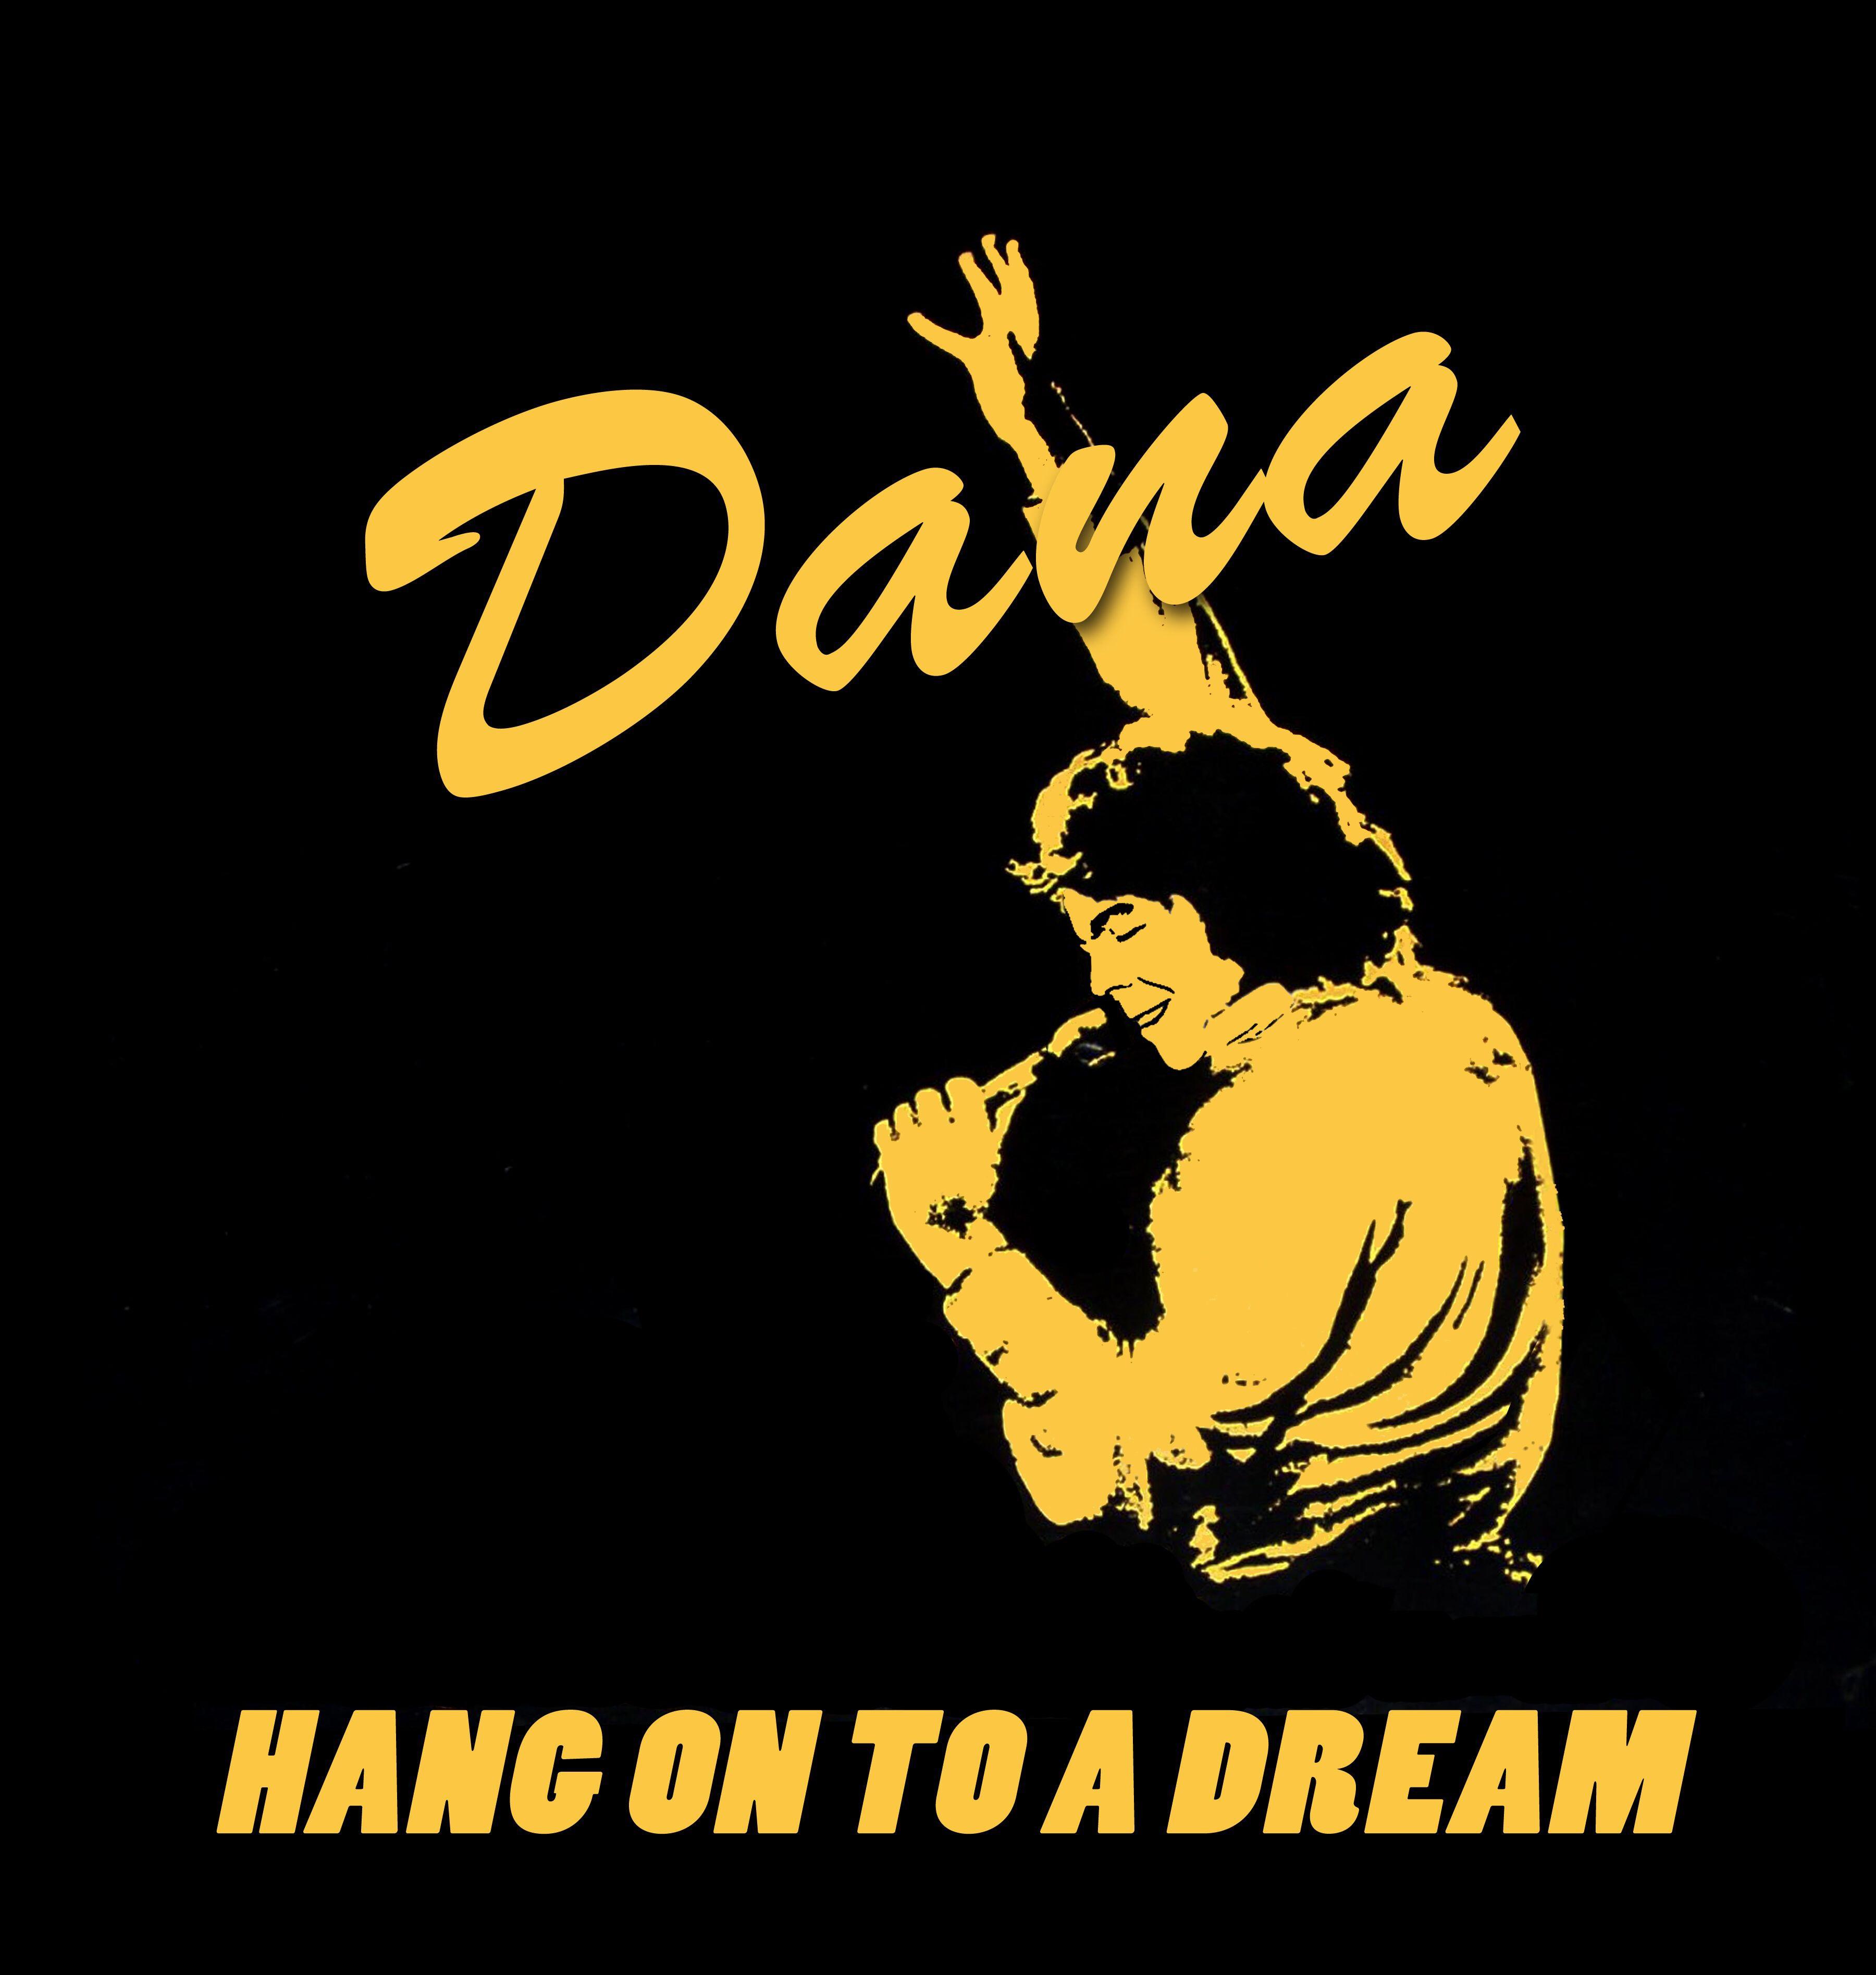 Dana – Hang On To A Dream